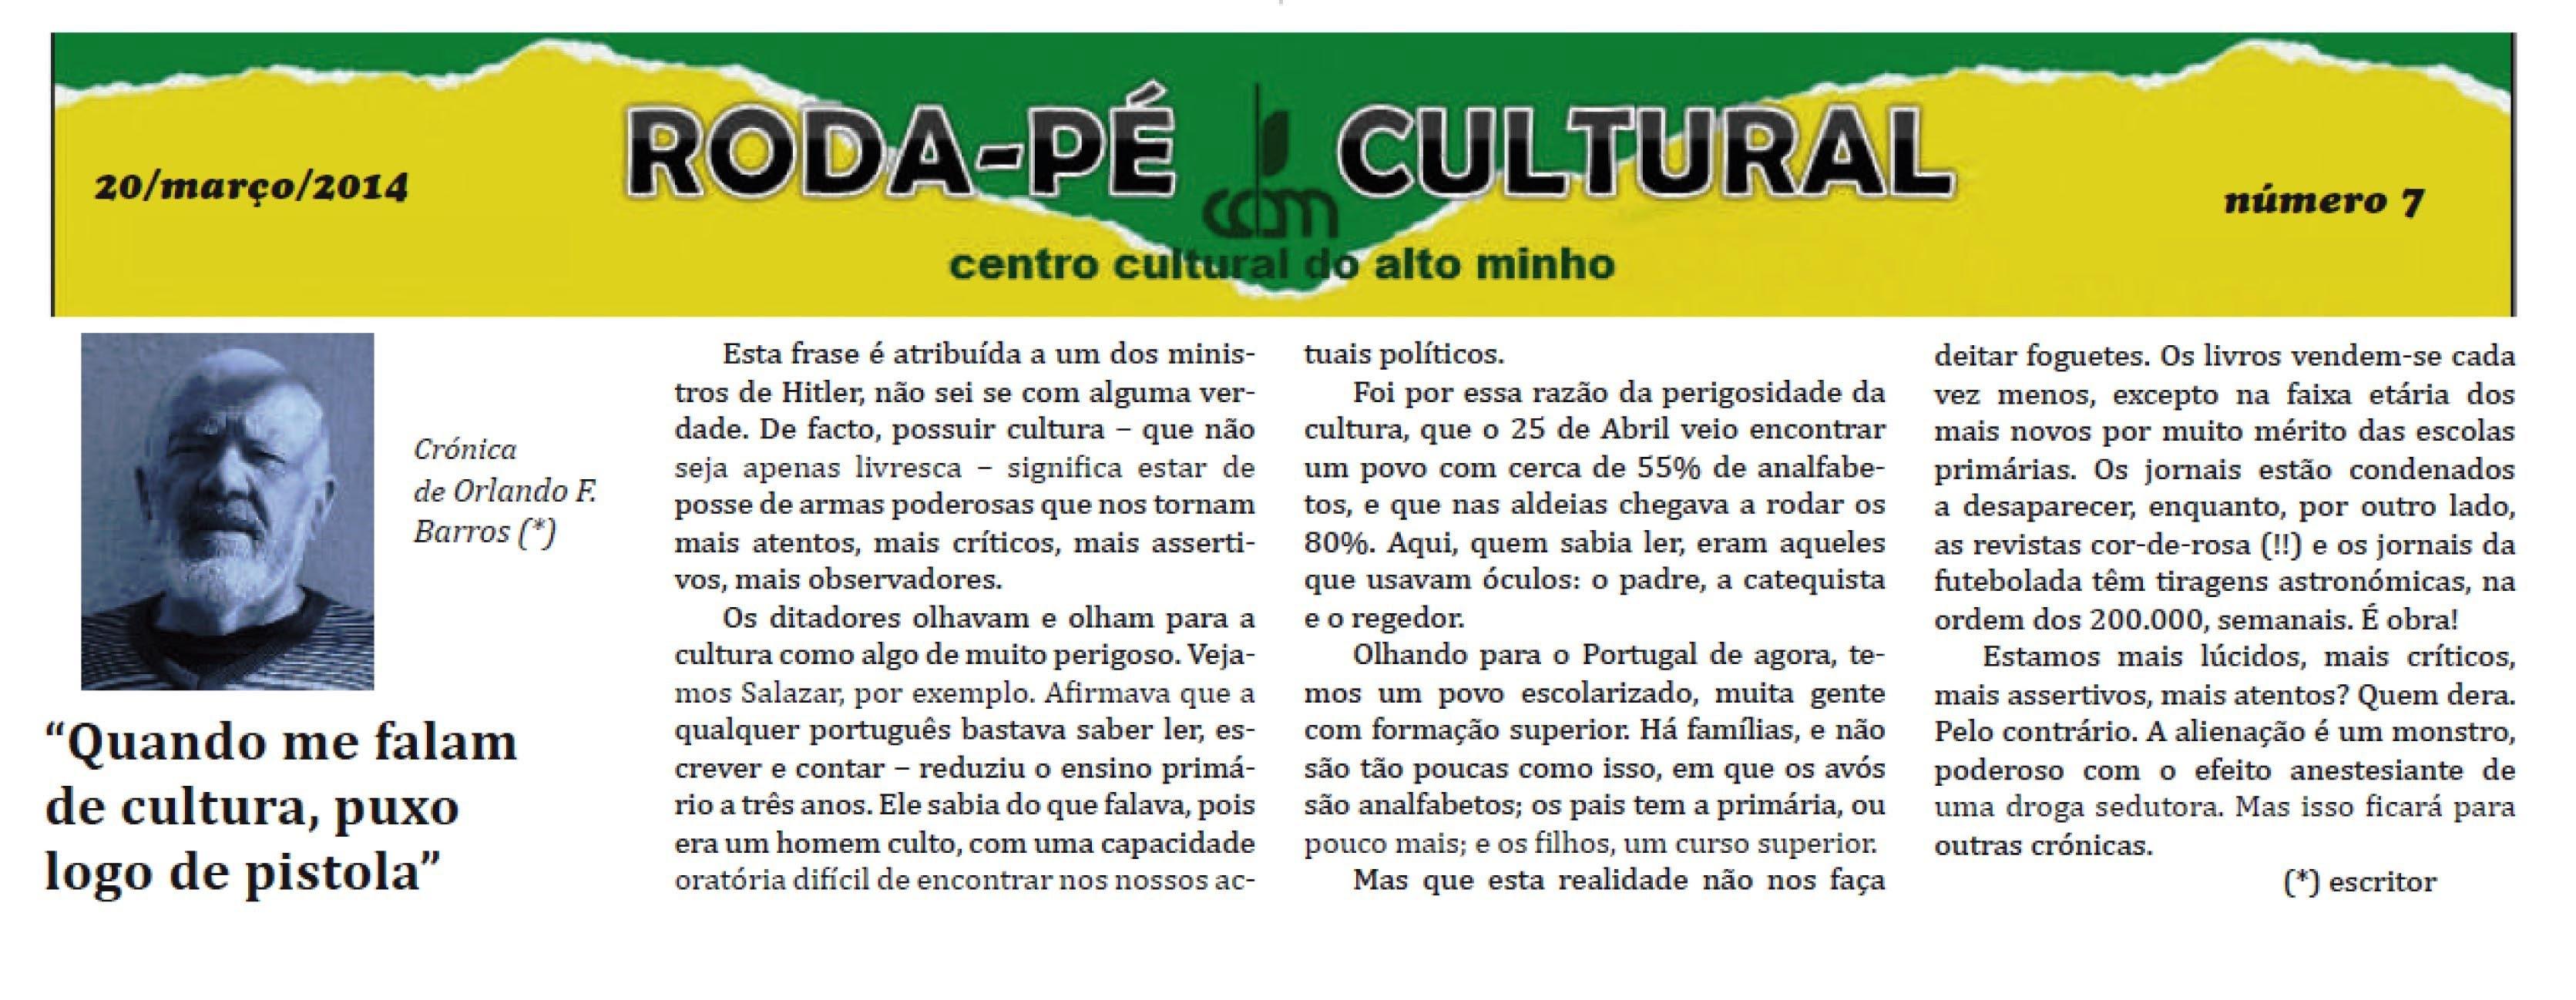 https://sites.google.com/a/centroculturaldoaltominho.org/ccam/actividades-realizadas/2014/RP_7.jpg?attredirects=0